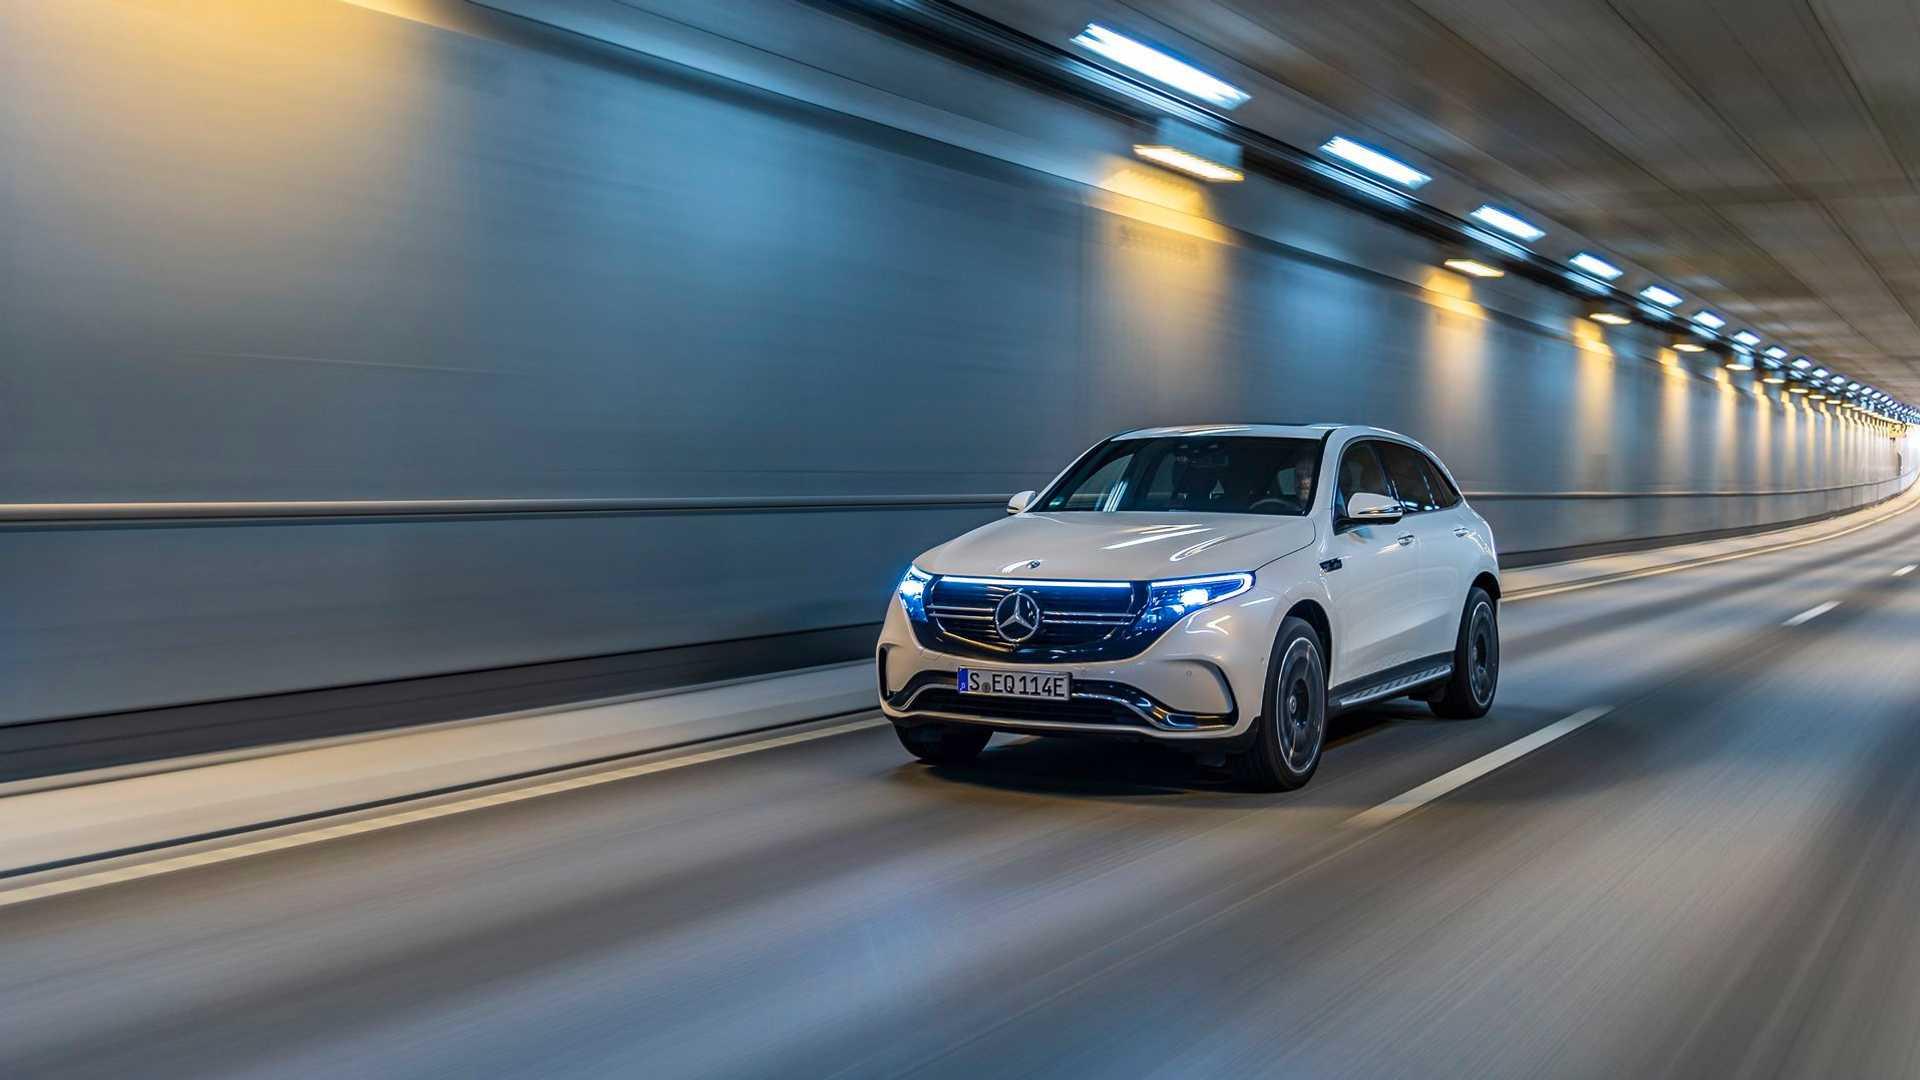 Mercedes Benz Eqc Tunnel